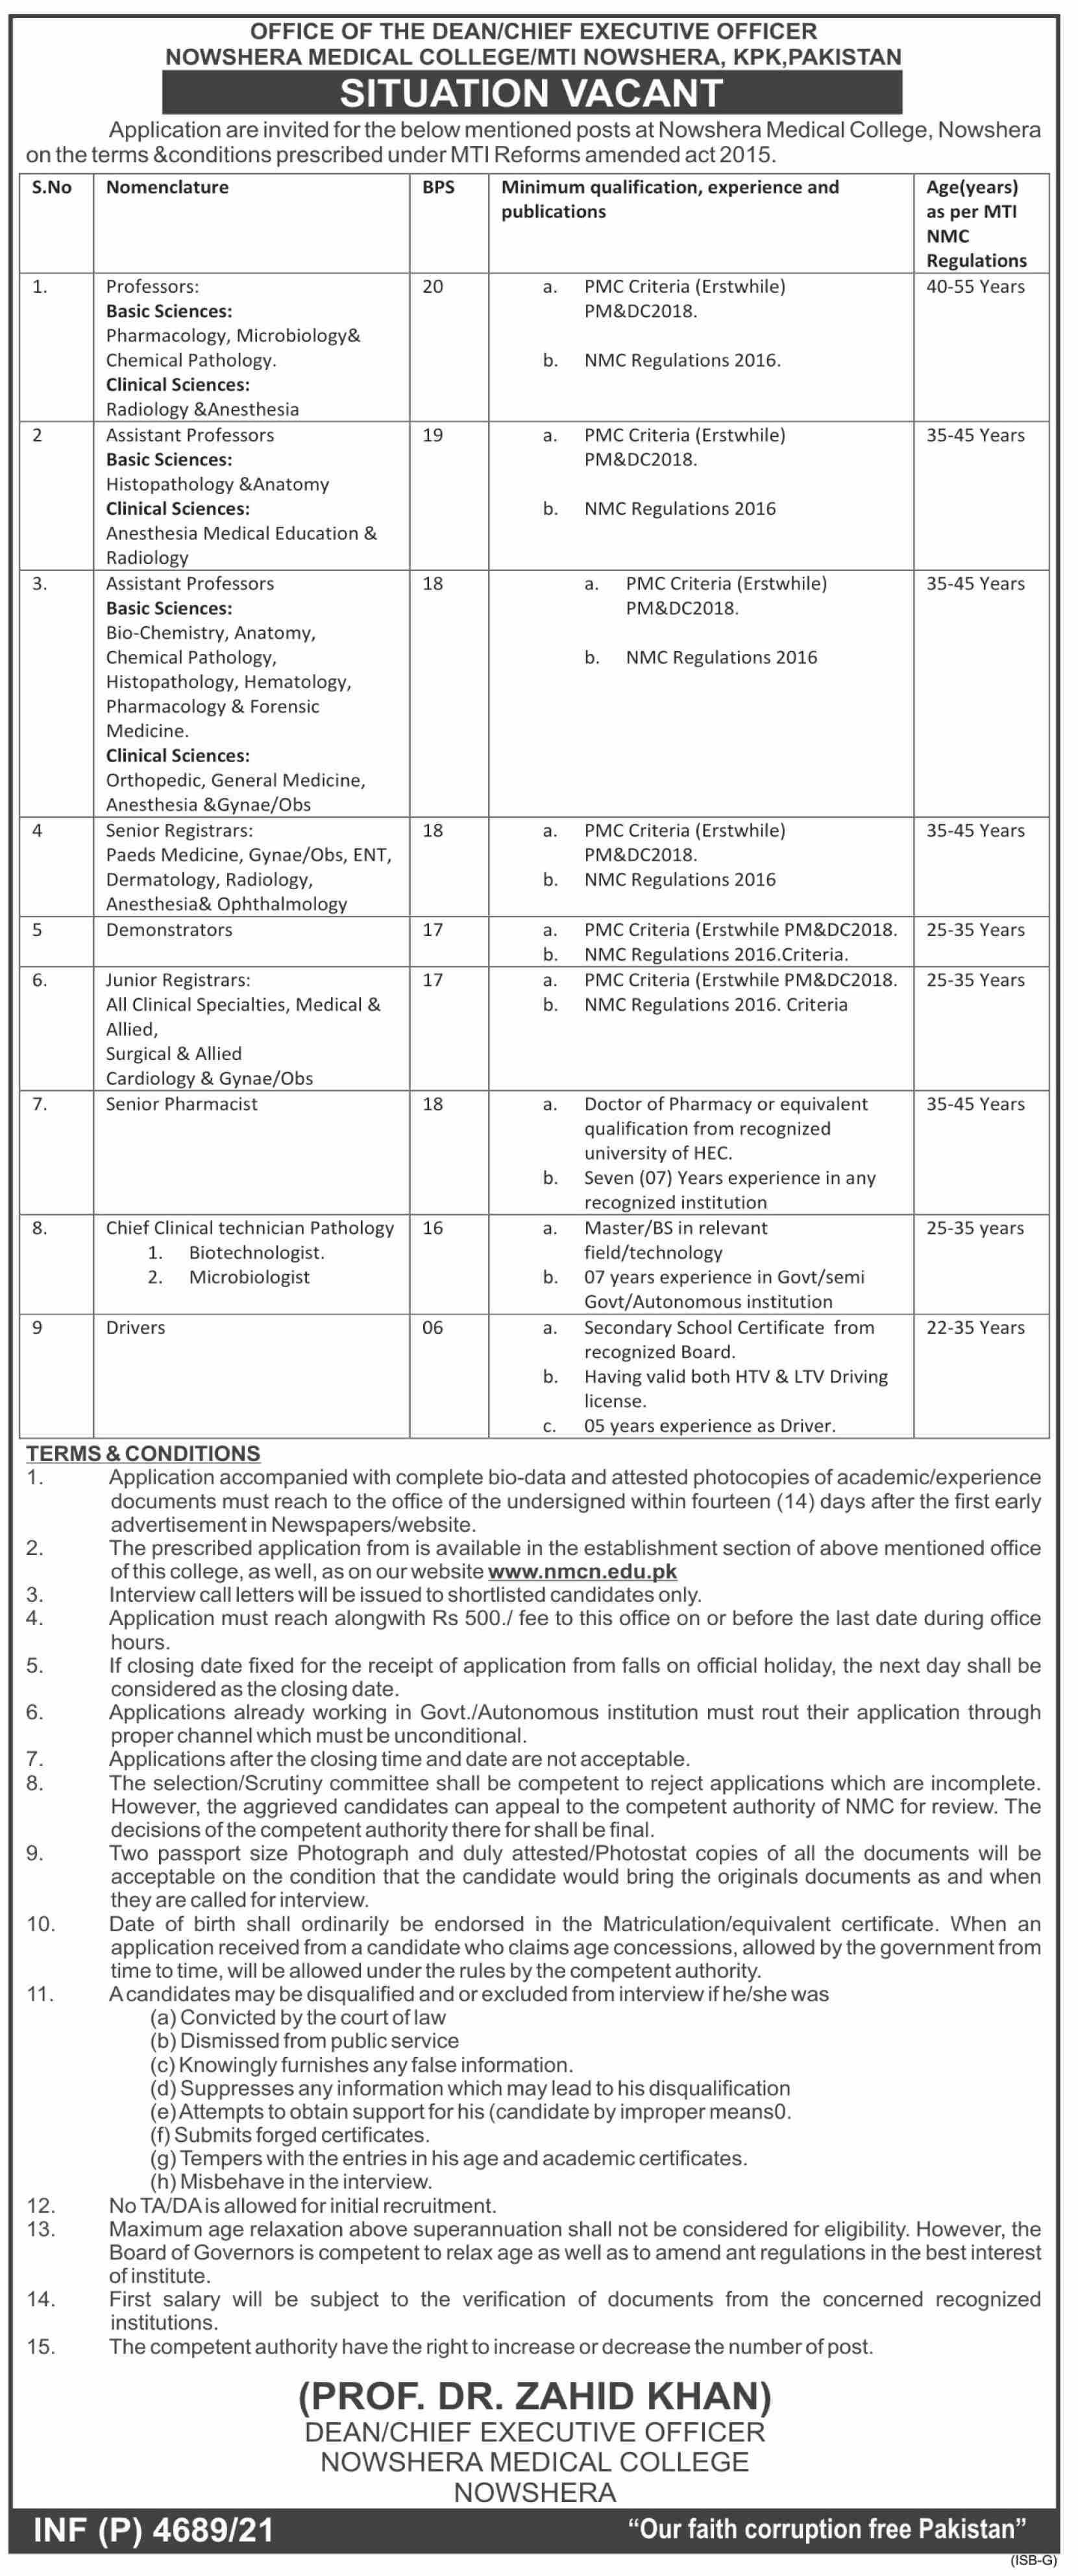 Nowshera Medical College jobs newspaper ad for Senior Registrar in Nowshera on 2021-09-14